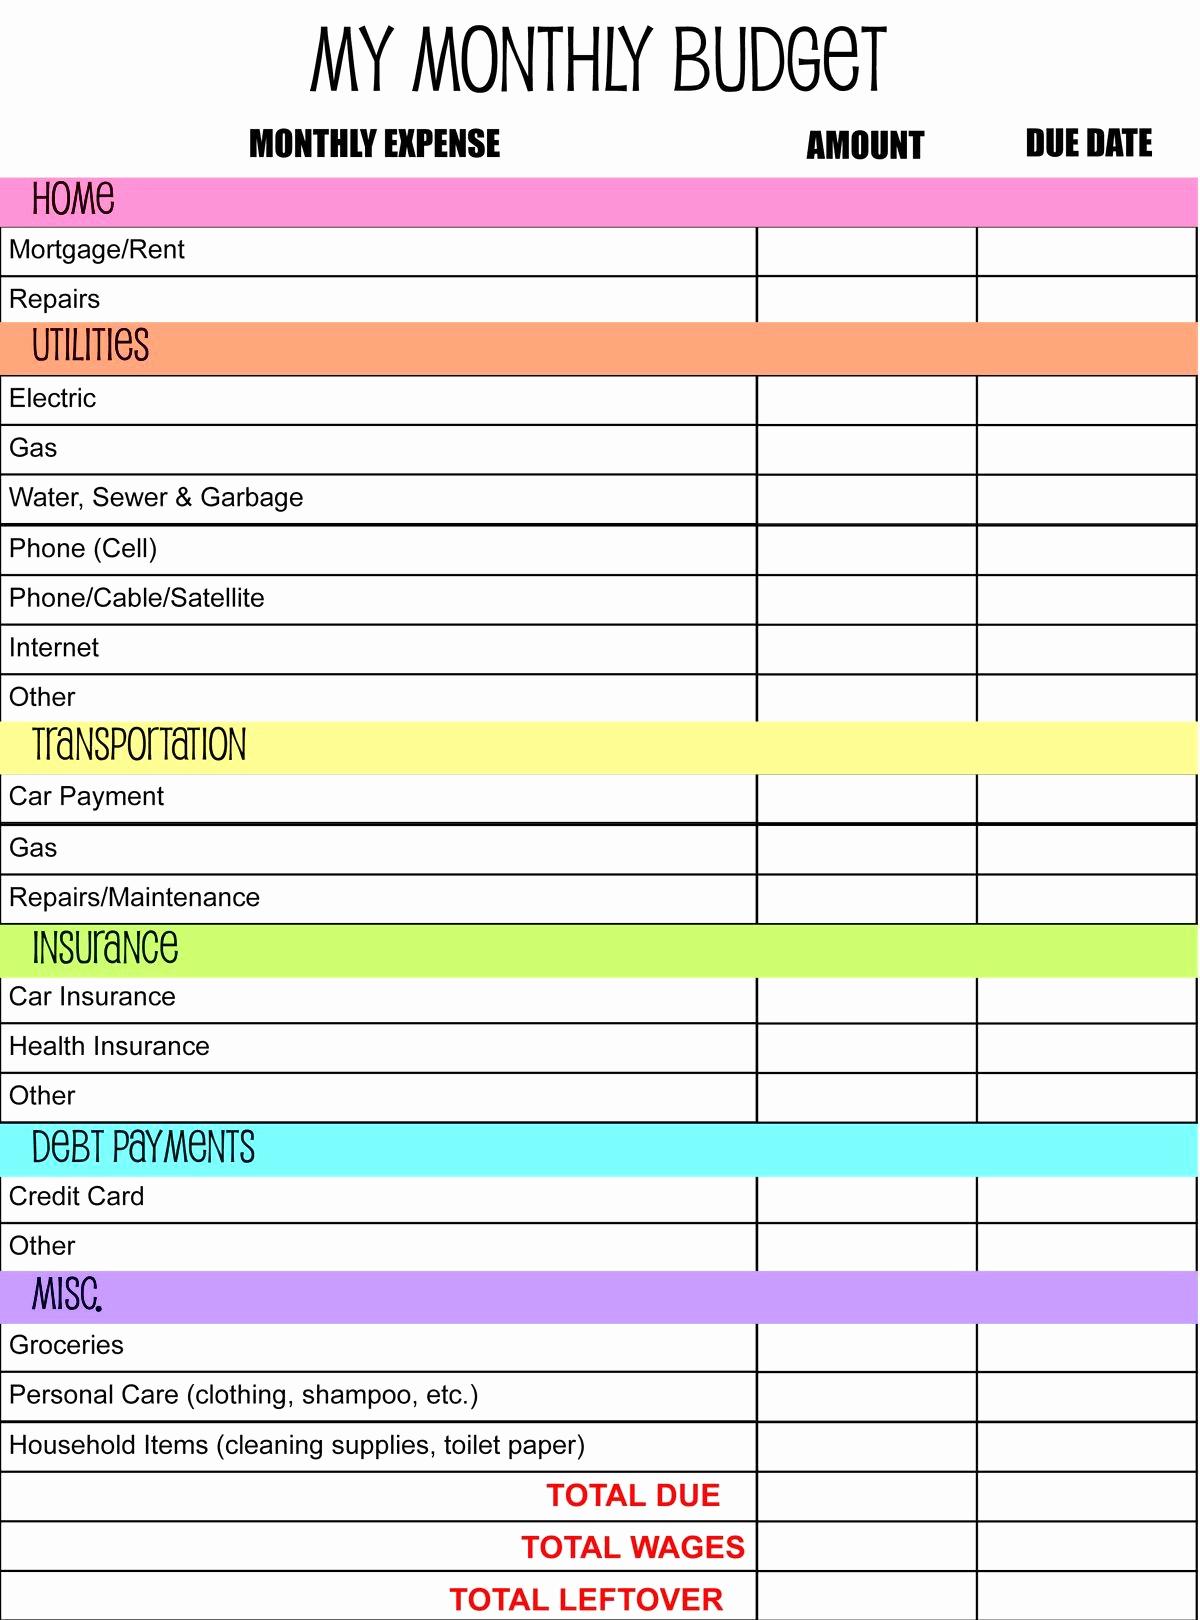 Auto Insurance Comparison Spreadsheet Spreadsheet Downloa